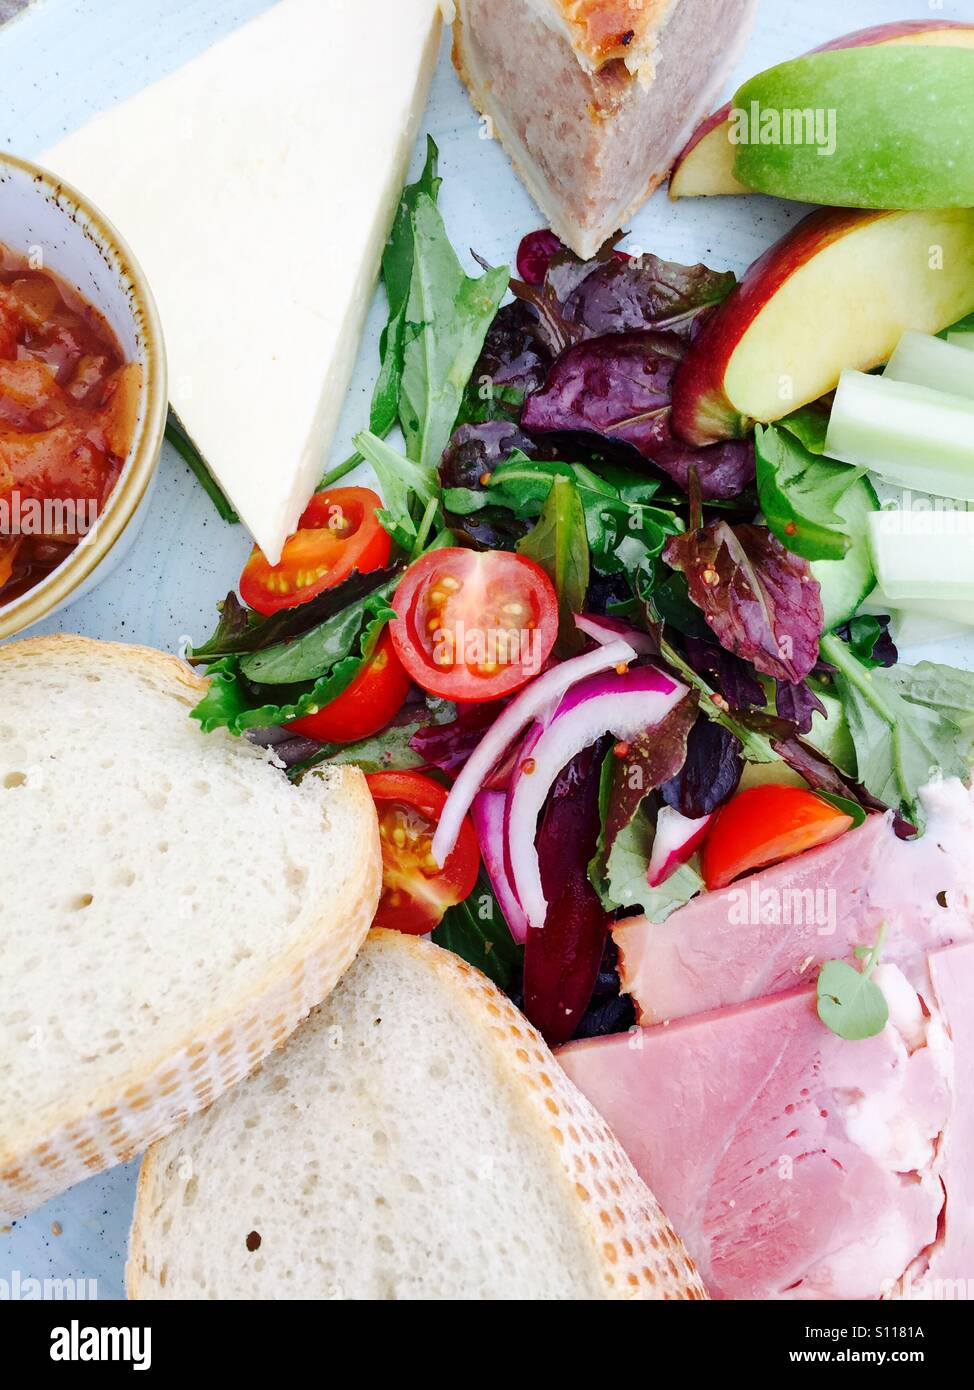 Colourful ploughman's salad - Stock Image